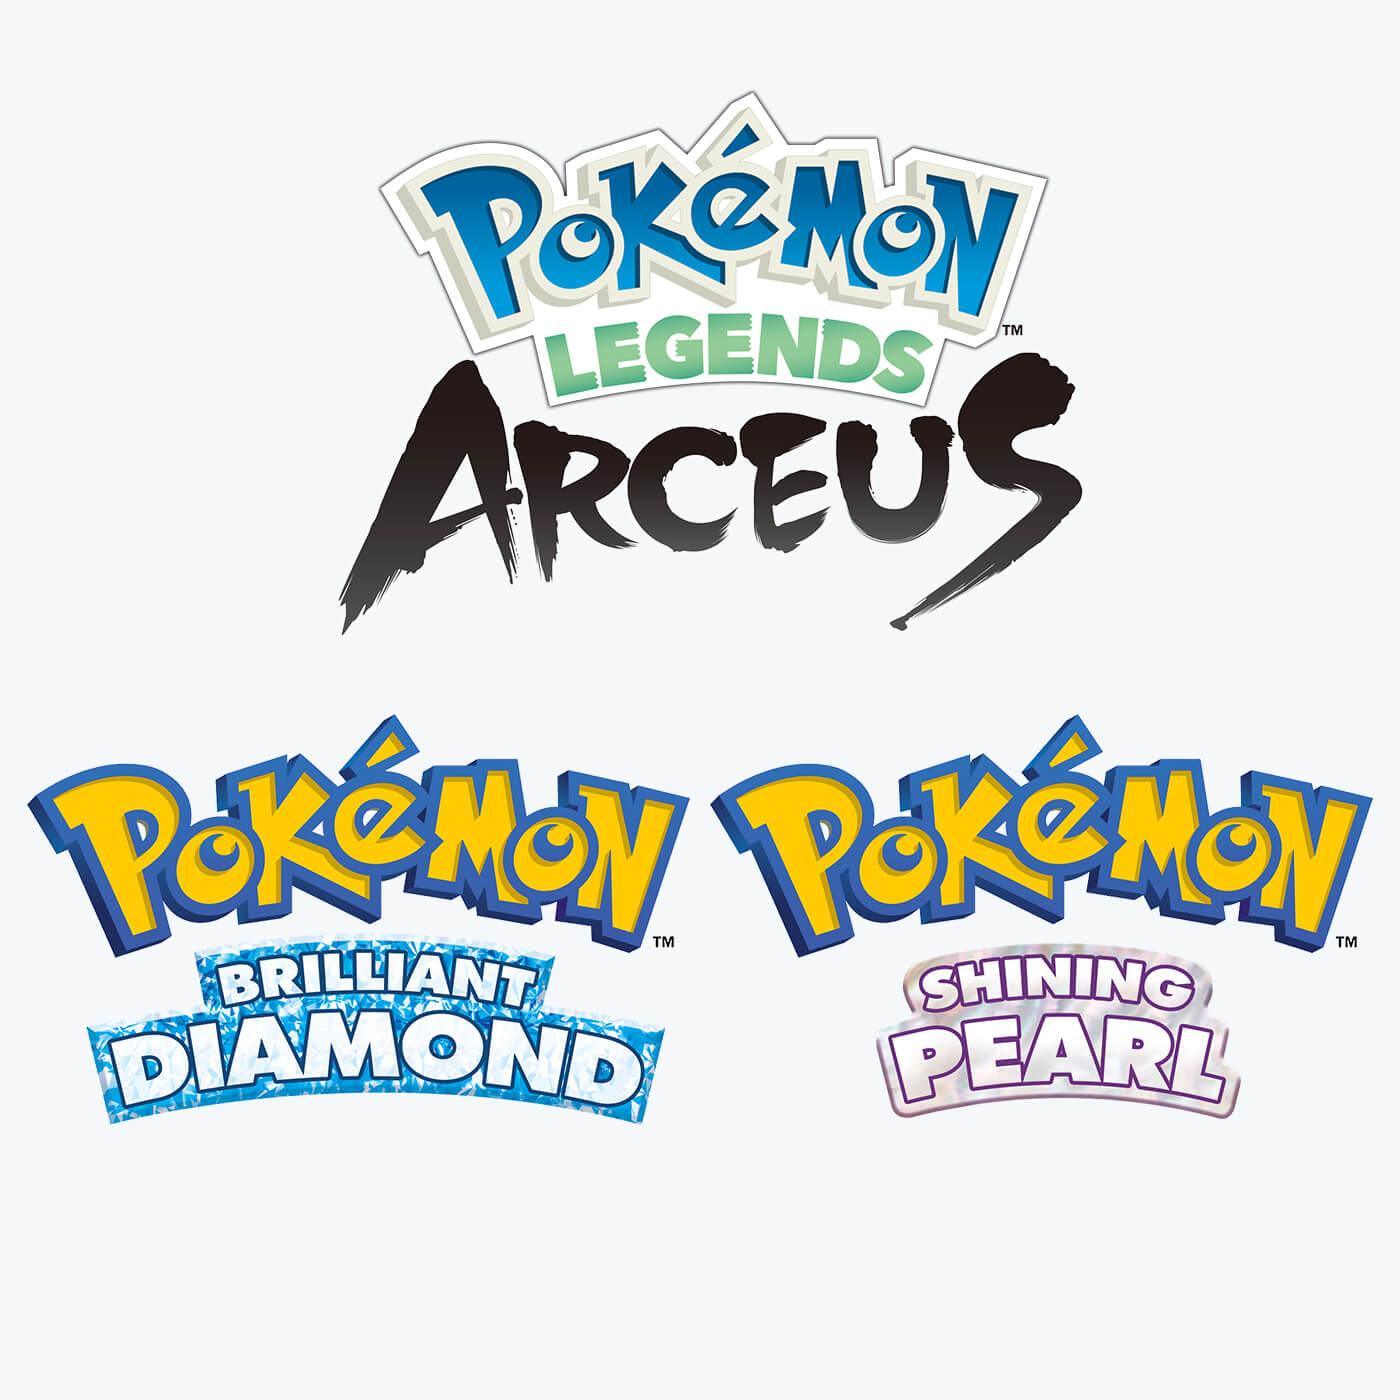 Pokémon Legends Arceus   |   Pokémon Brilliant Diamond and Pokémon Shining Pearl